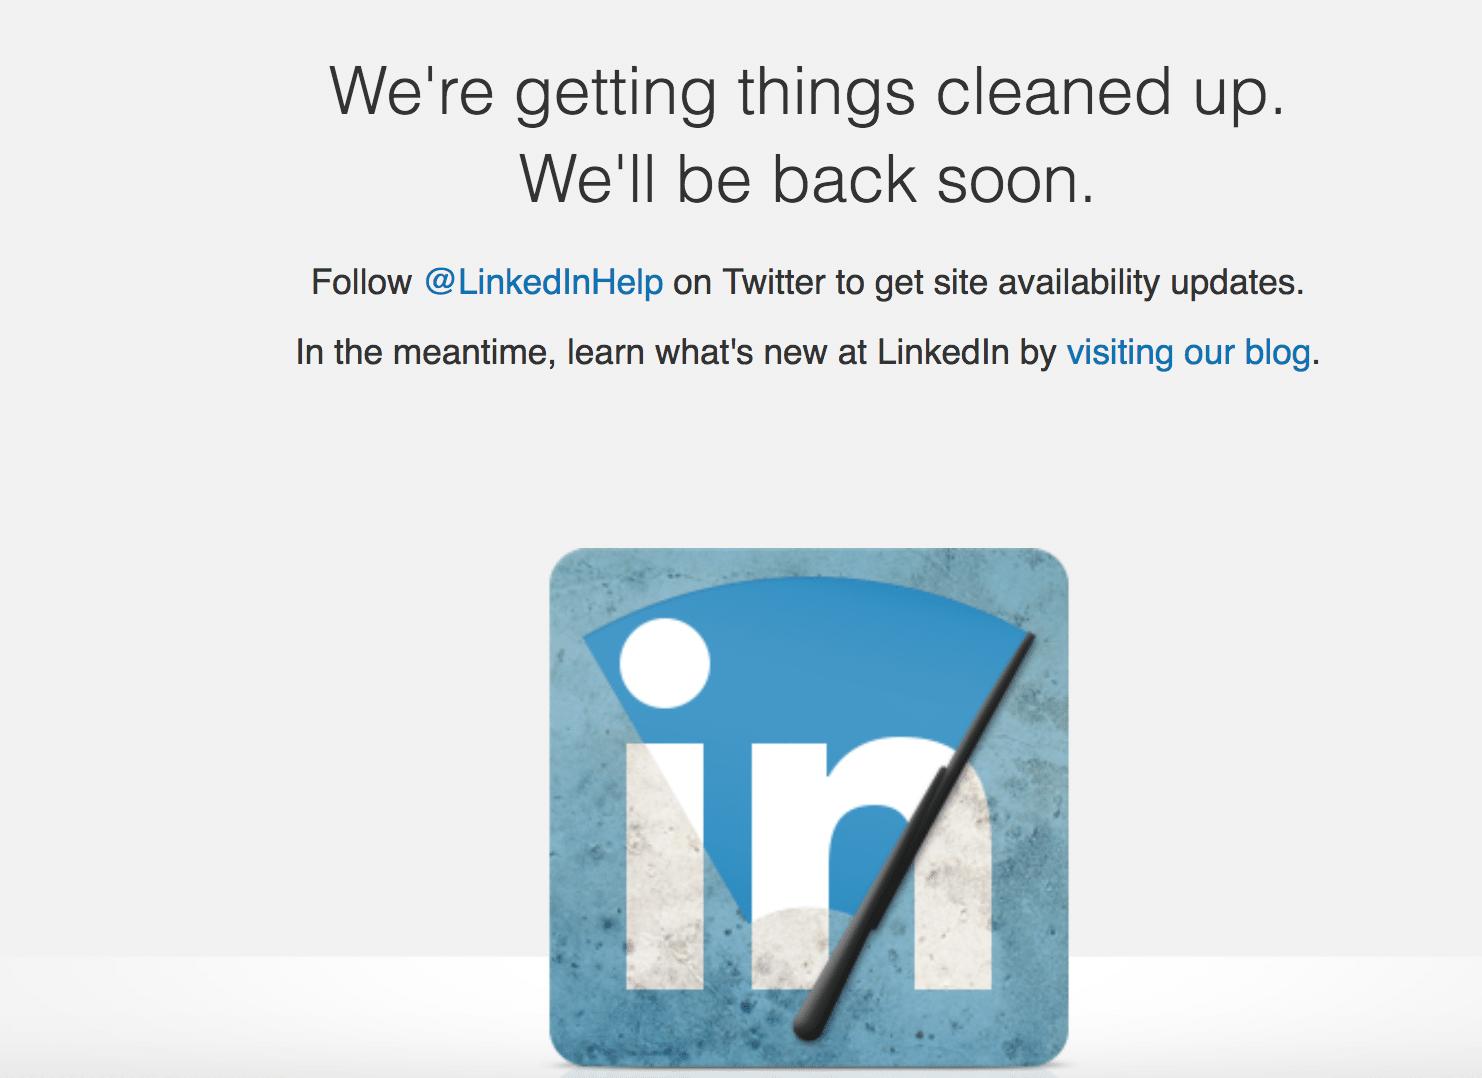 LinkedIn cleaing things up